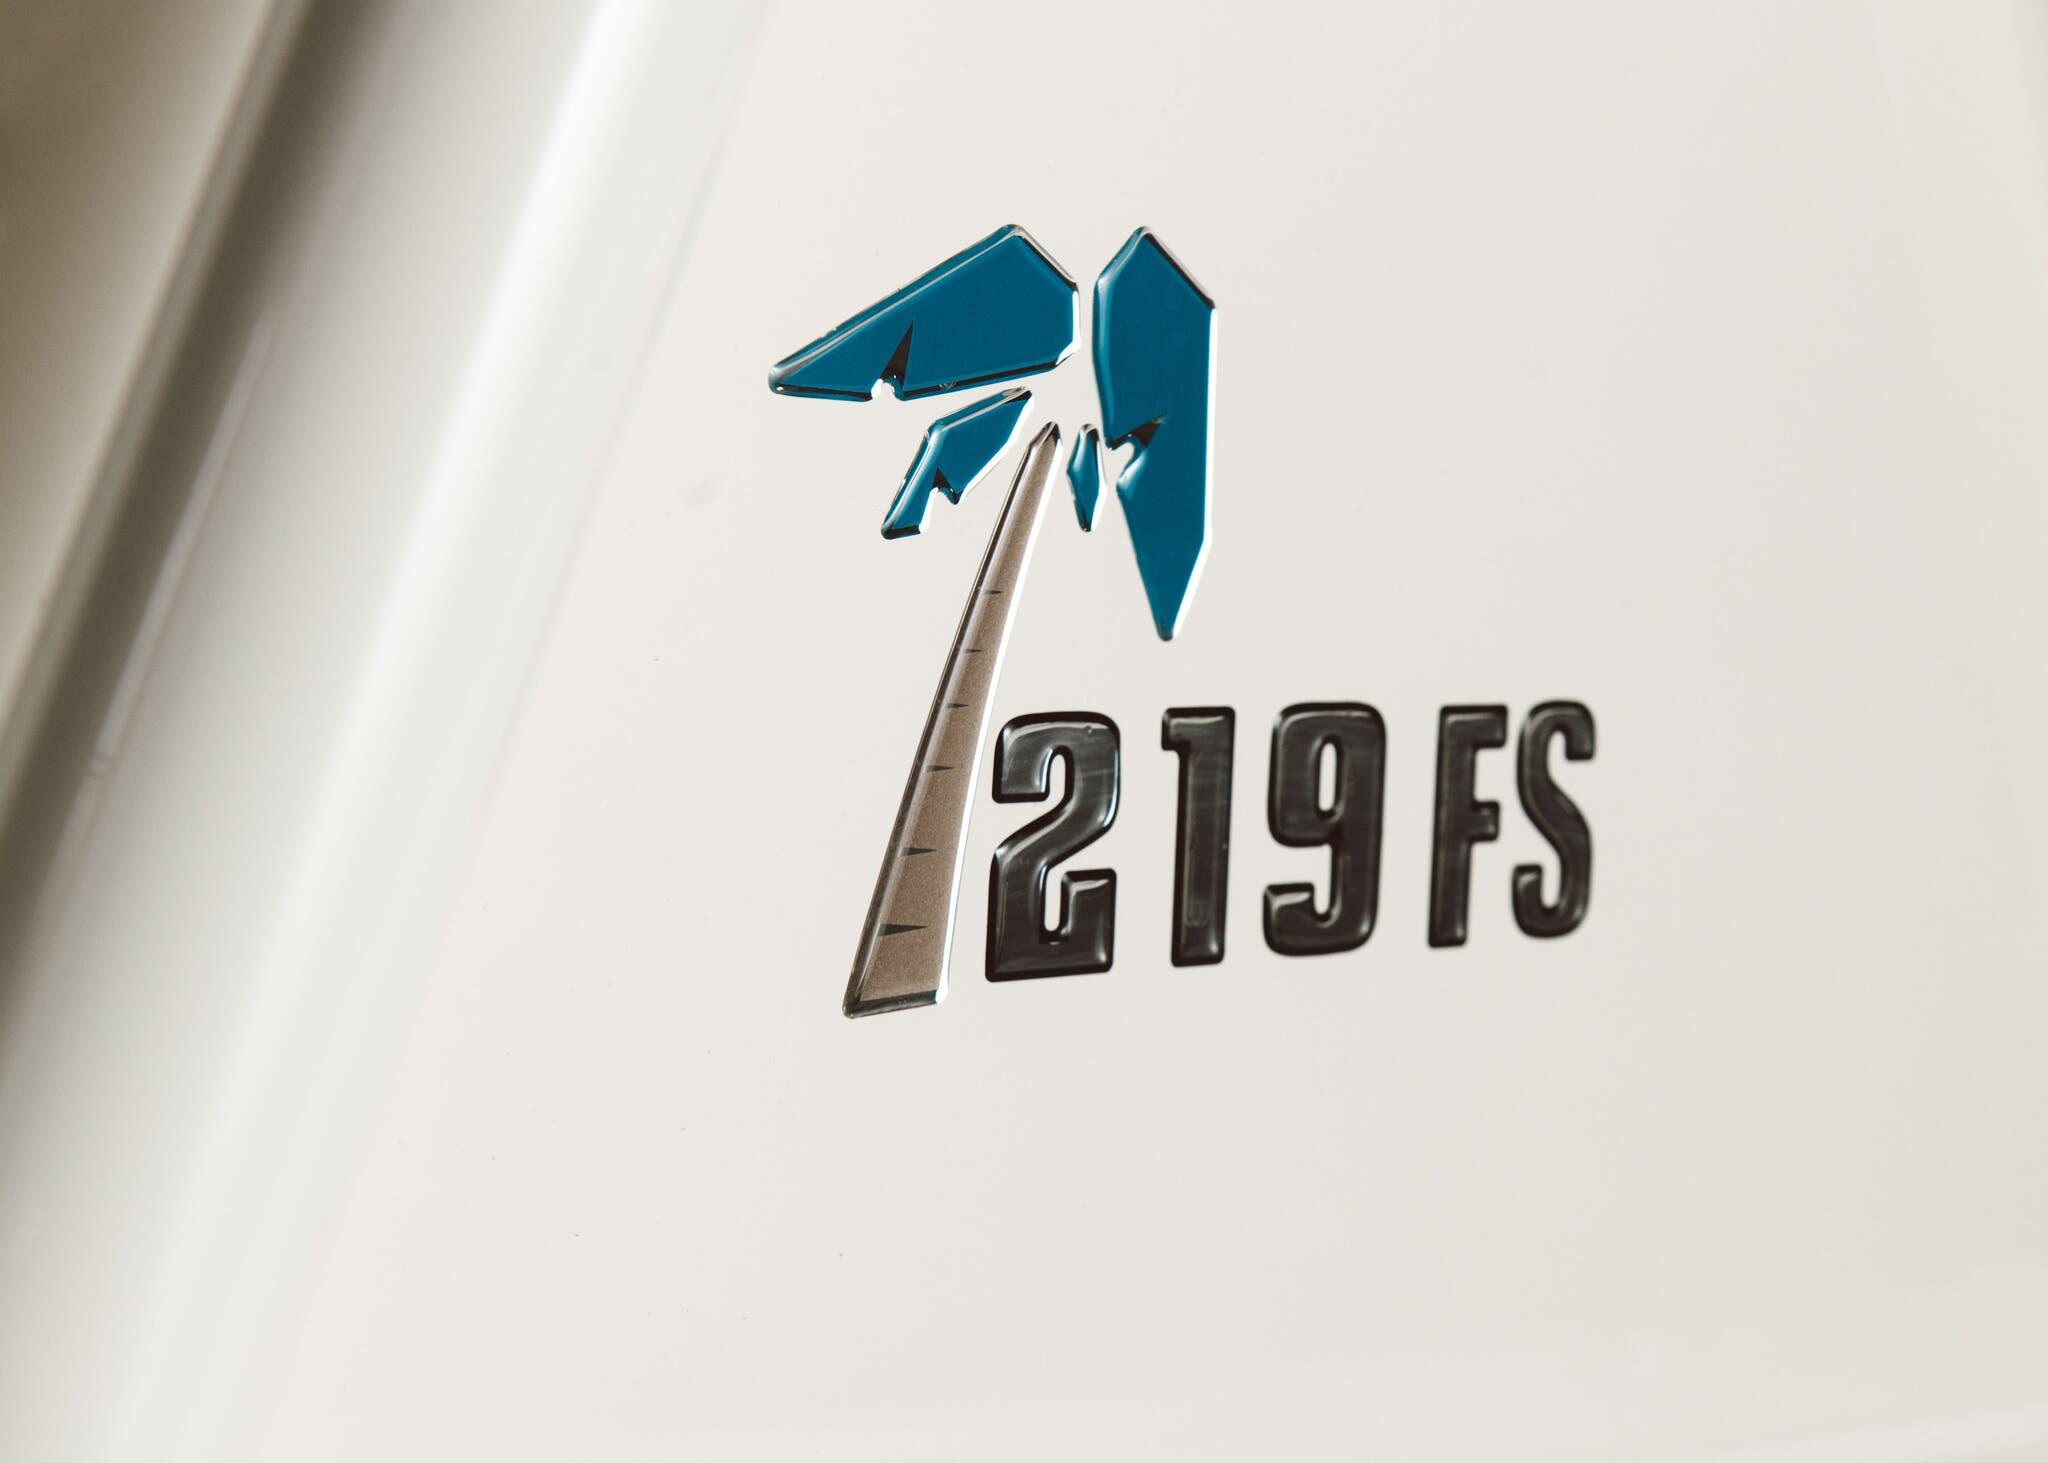 2021 Key West Center Console 219FS